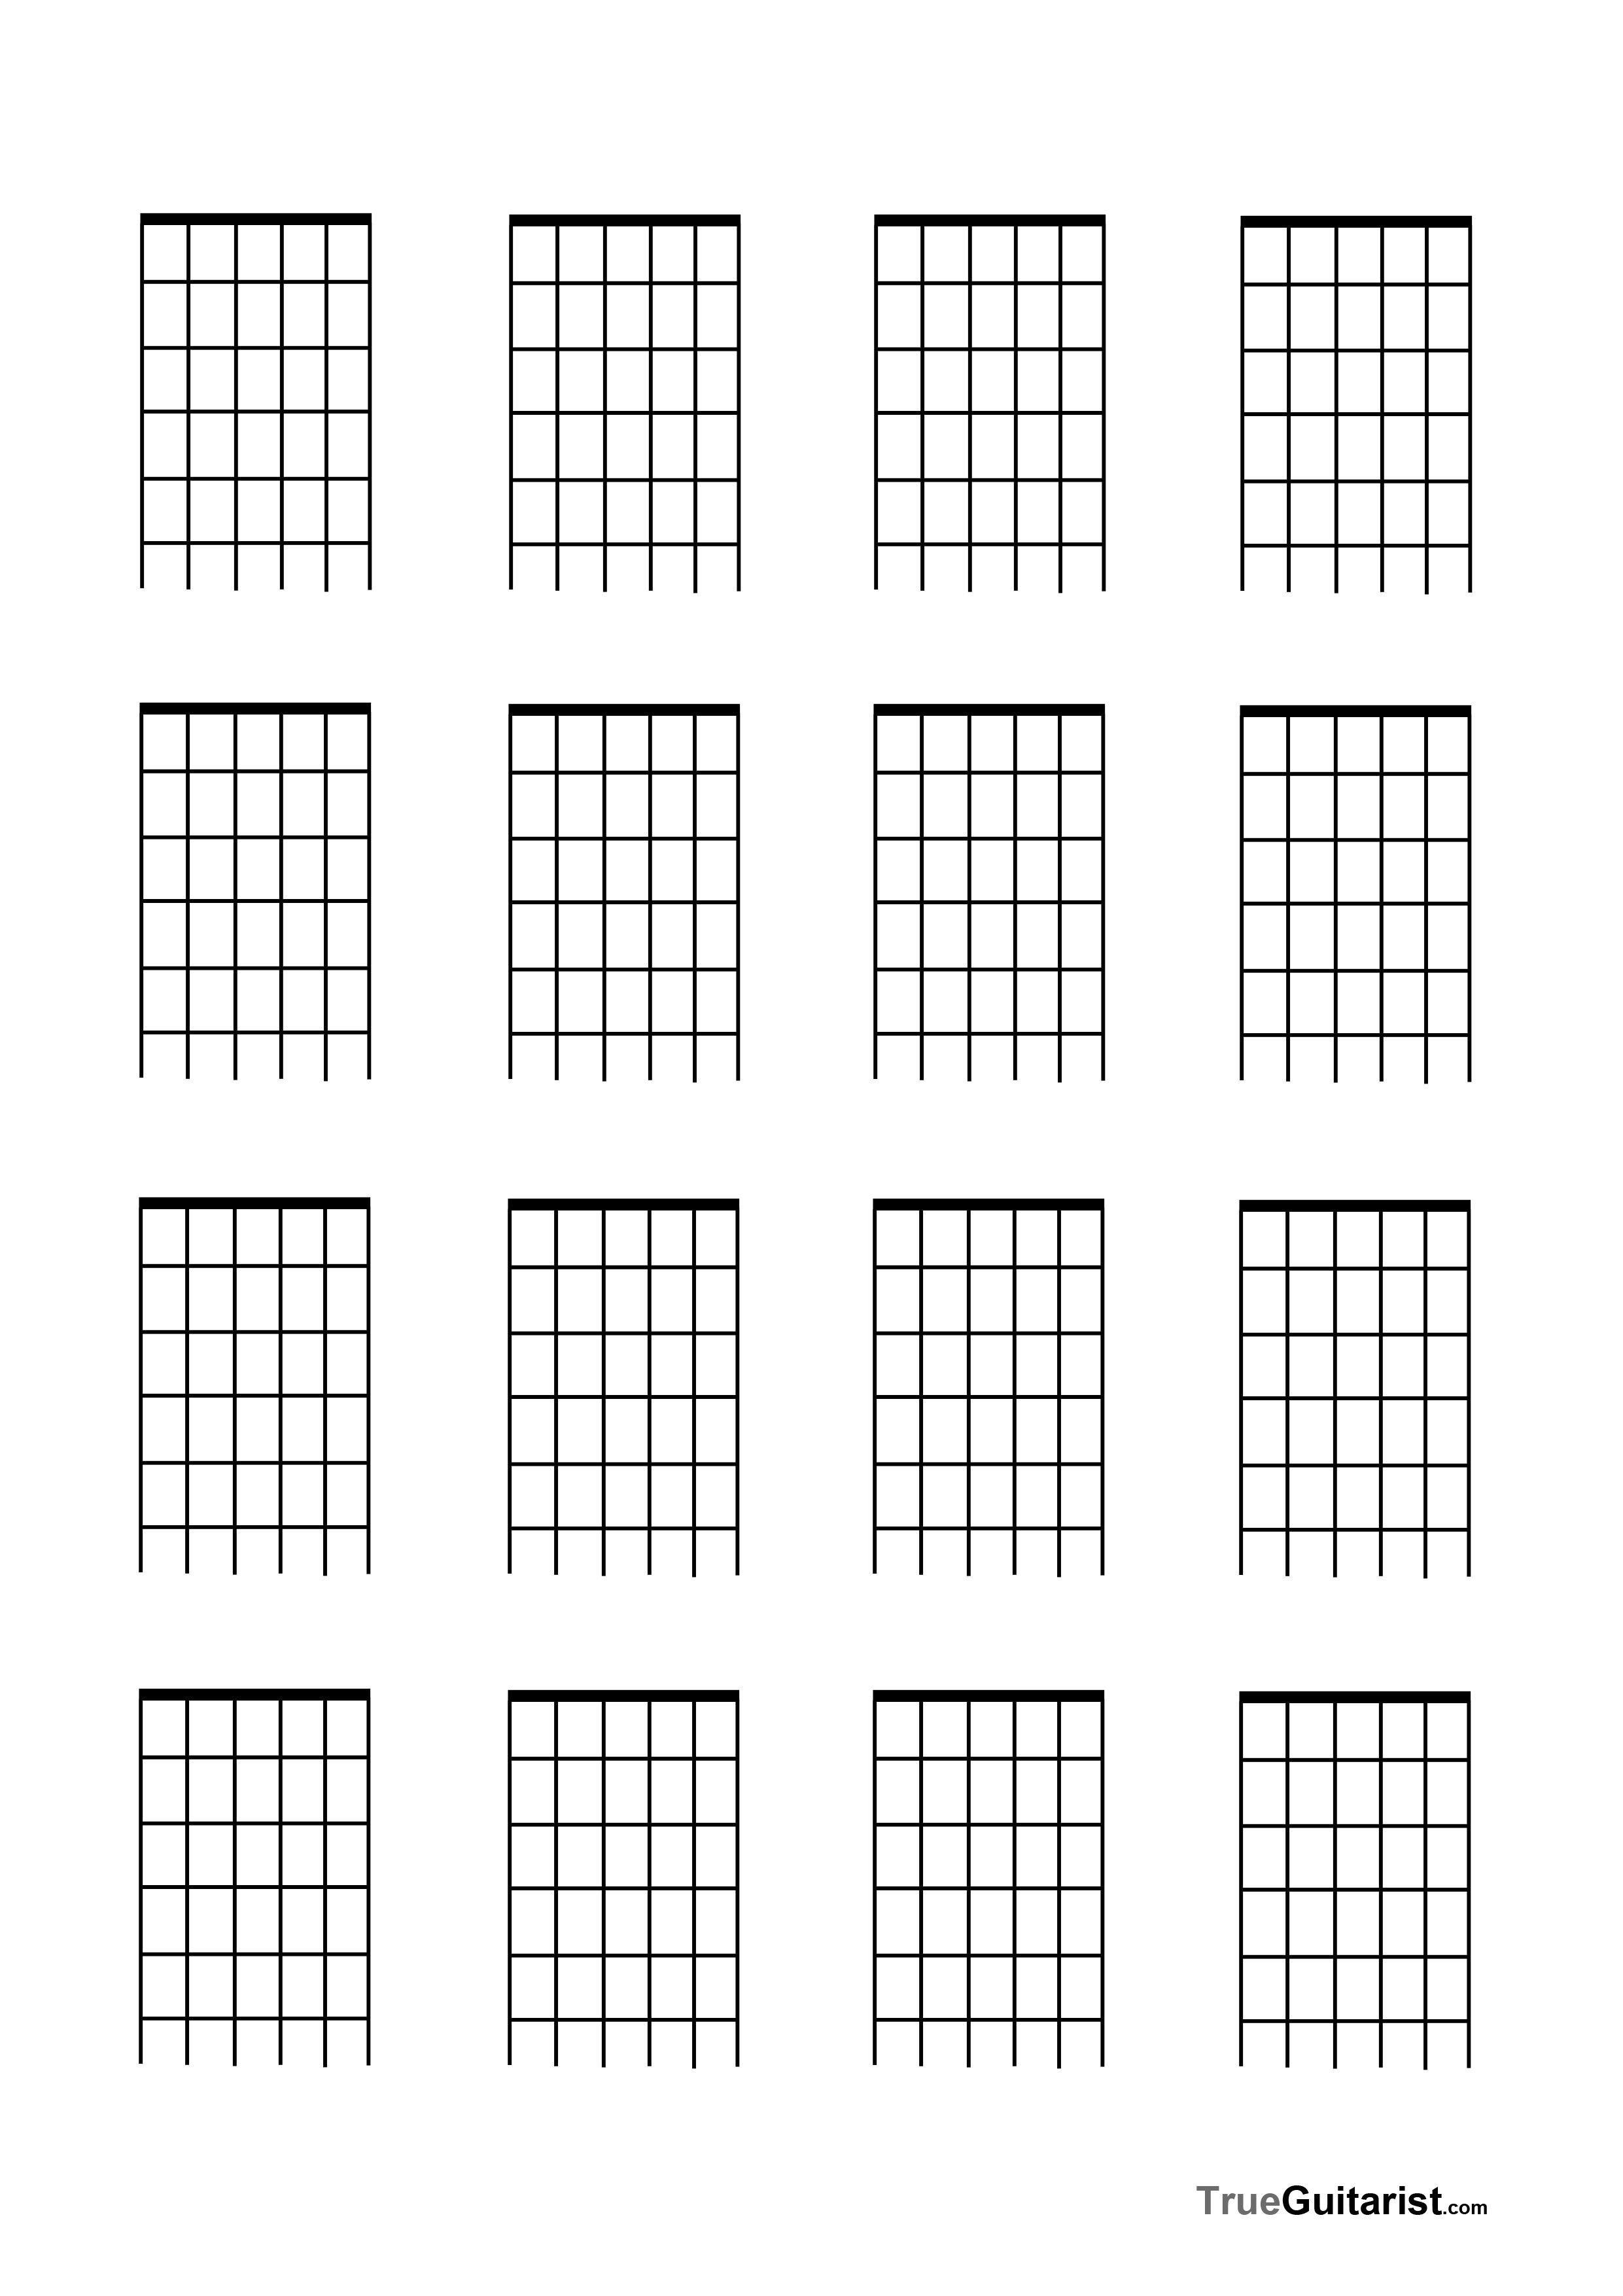 Blank Guitar Chord Sheet Pin by Jessica Avery On Matt